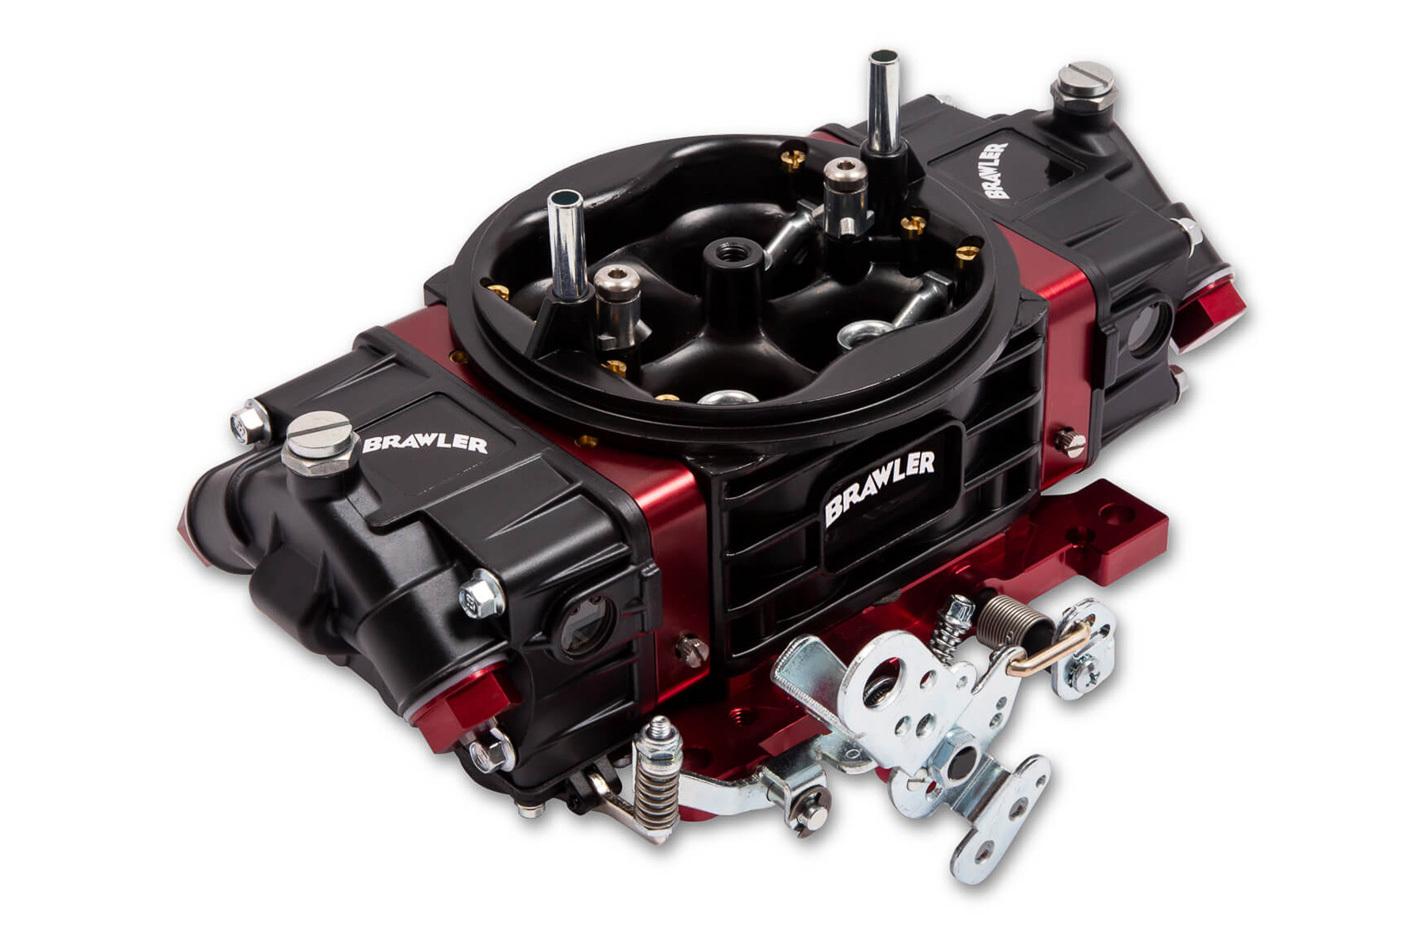 Quick Fuel Technology 850CFM Carburetor - Brawler Race Series